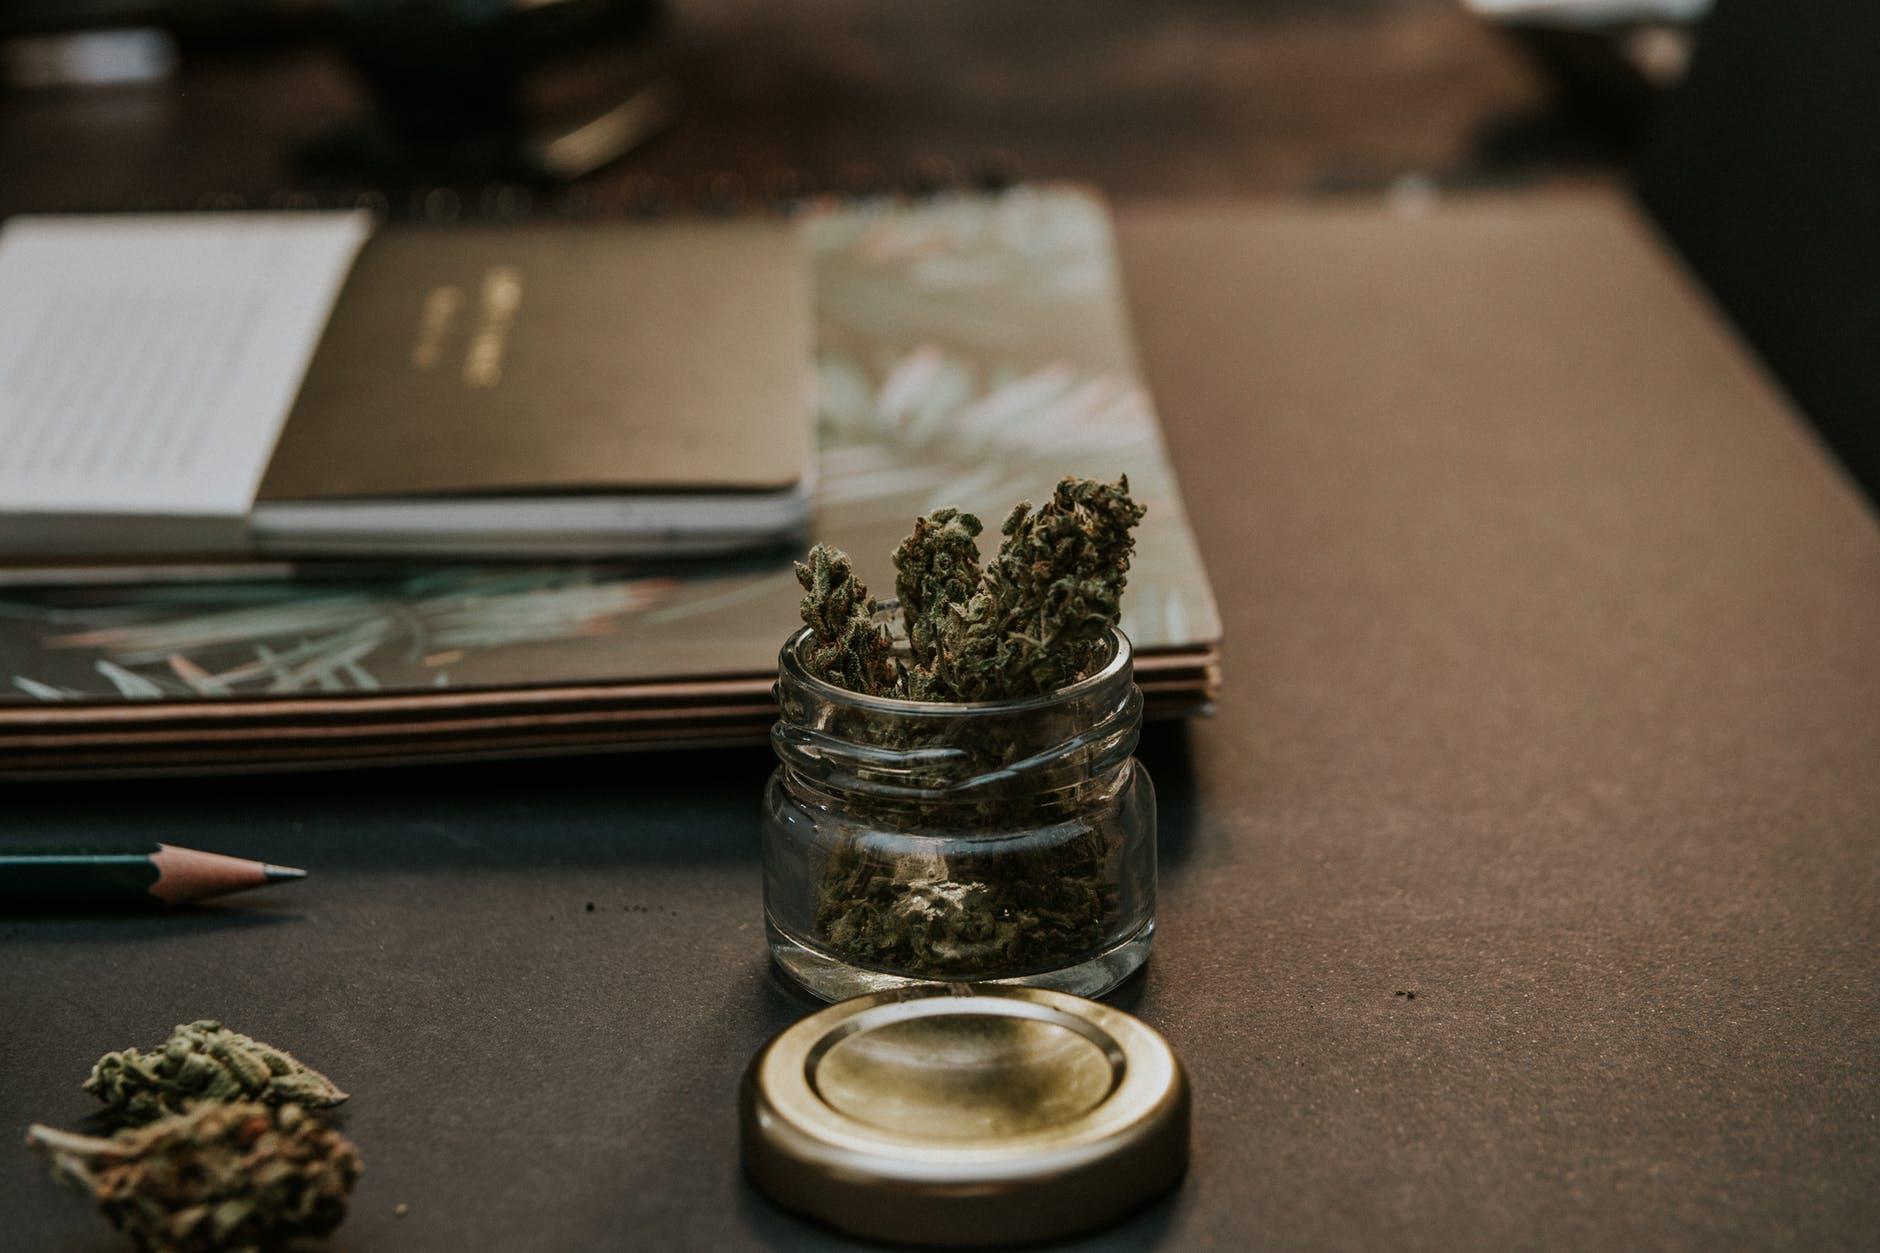 Medical Marijuana: Therapeutic Godsend Or Trigger For Extreme Paranoia?